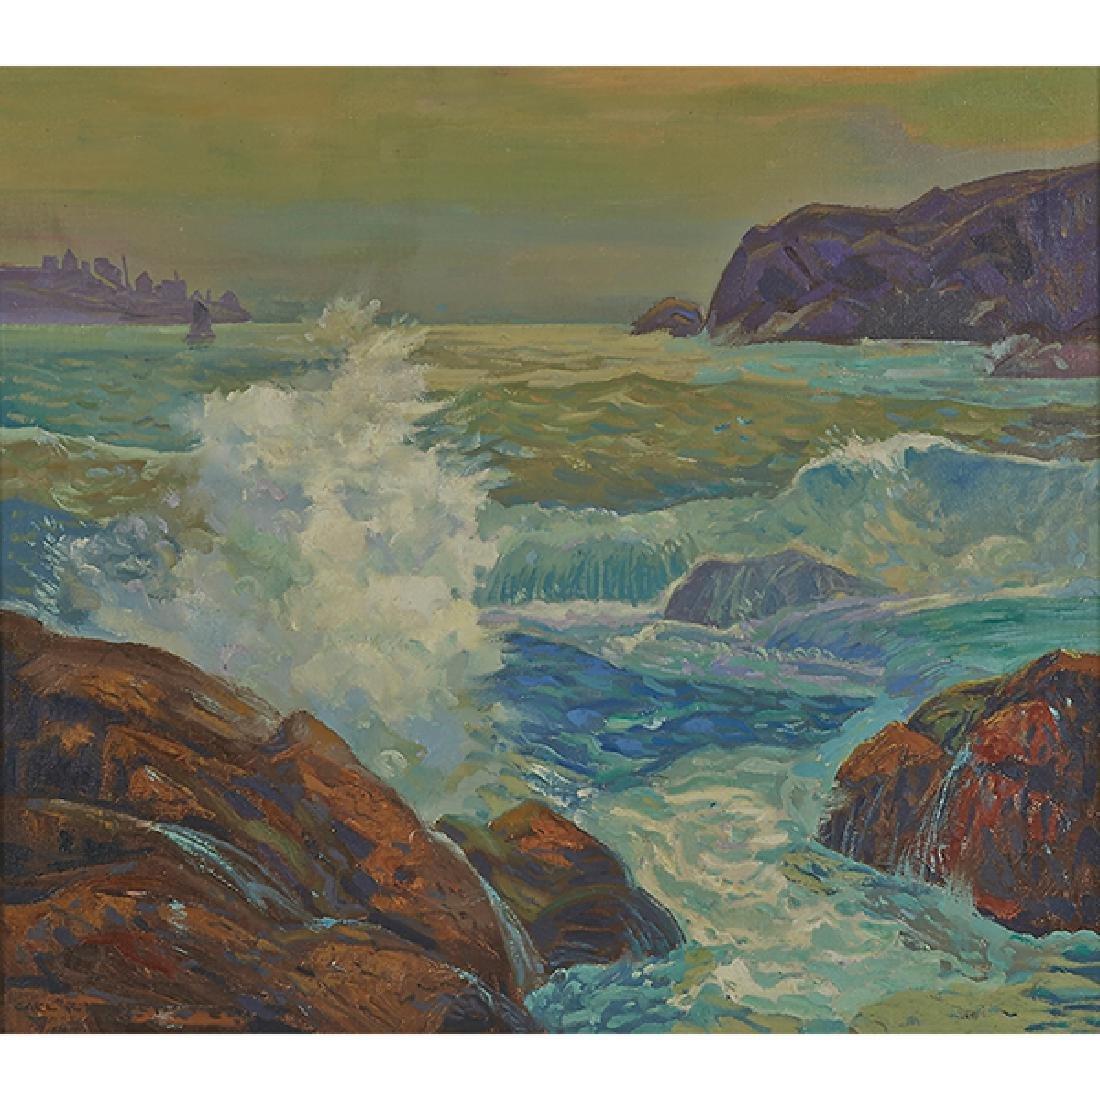 Carl Krafft, (American, 1884-1938), Seascape, oil on